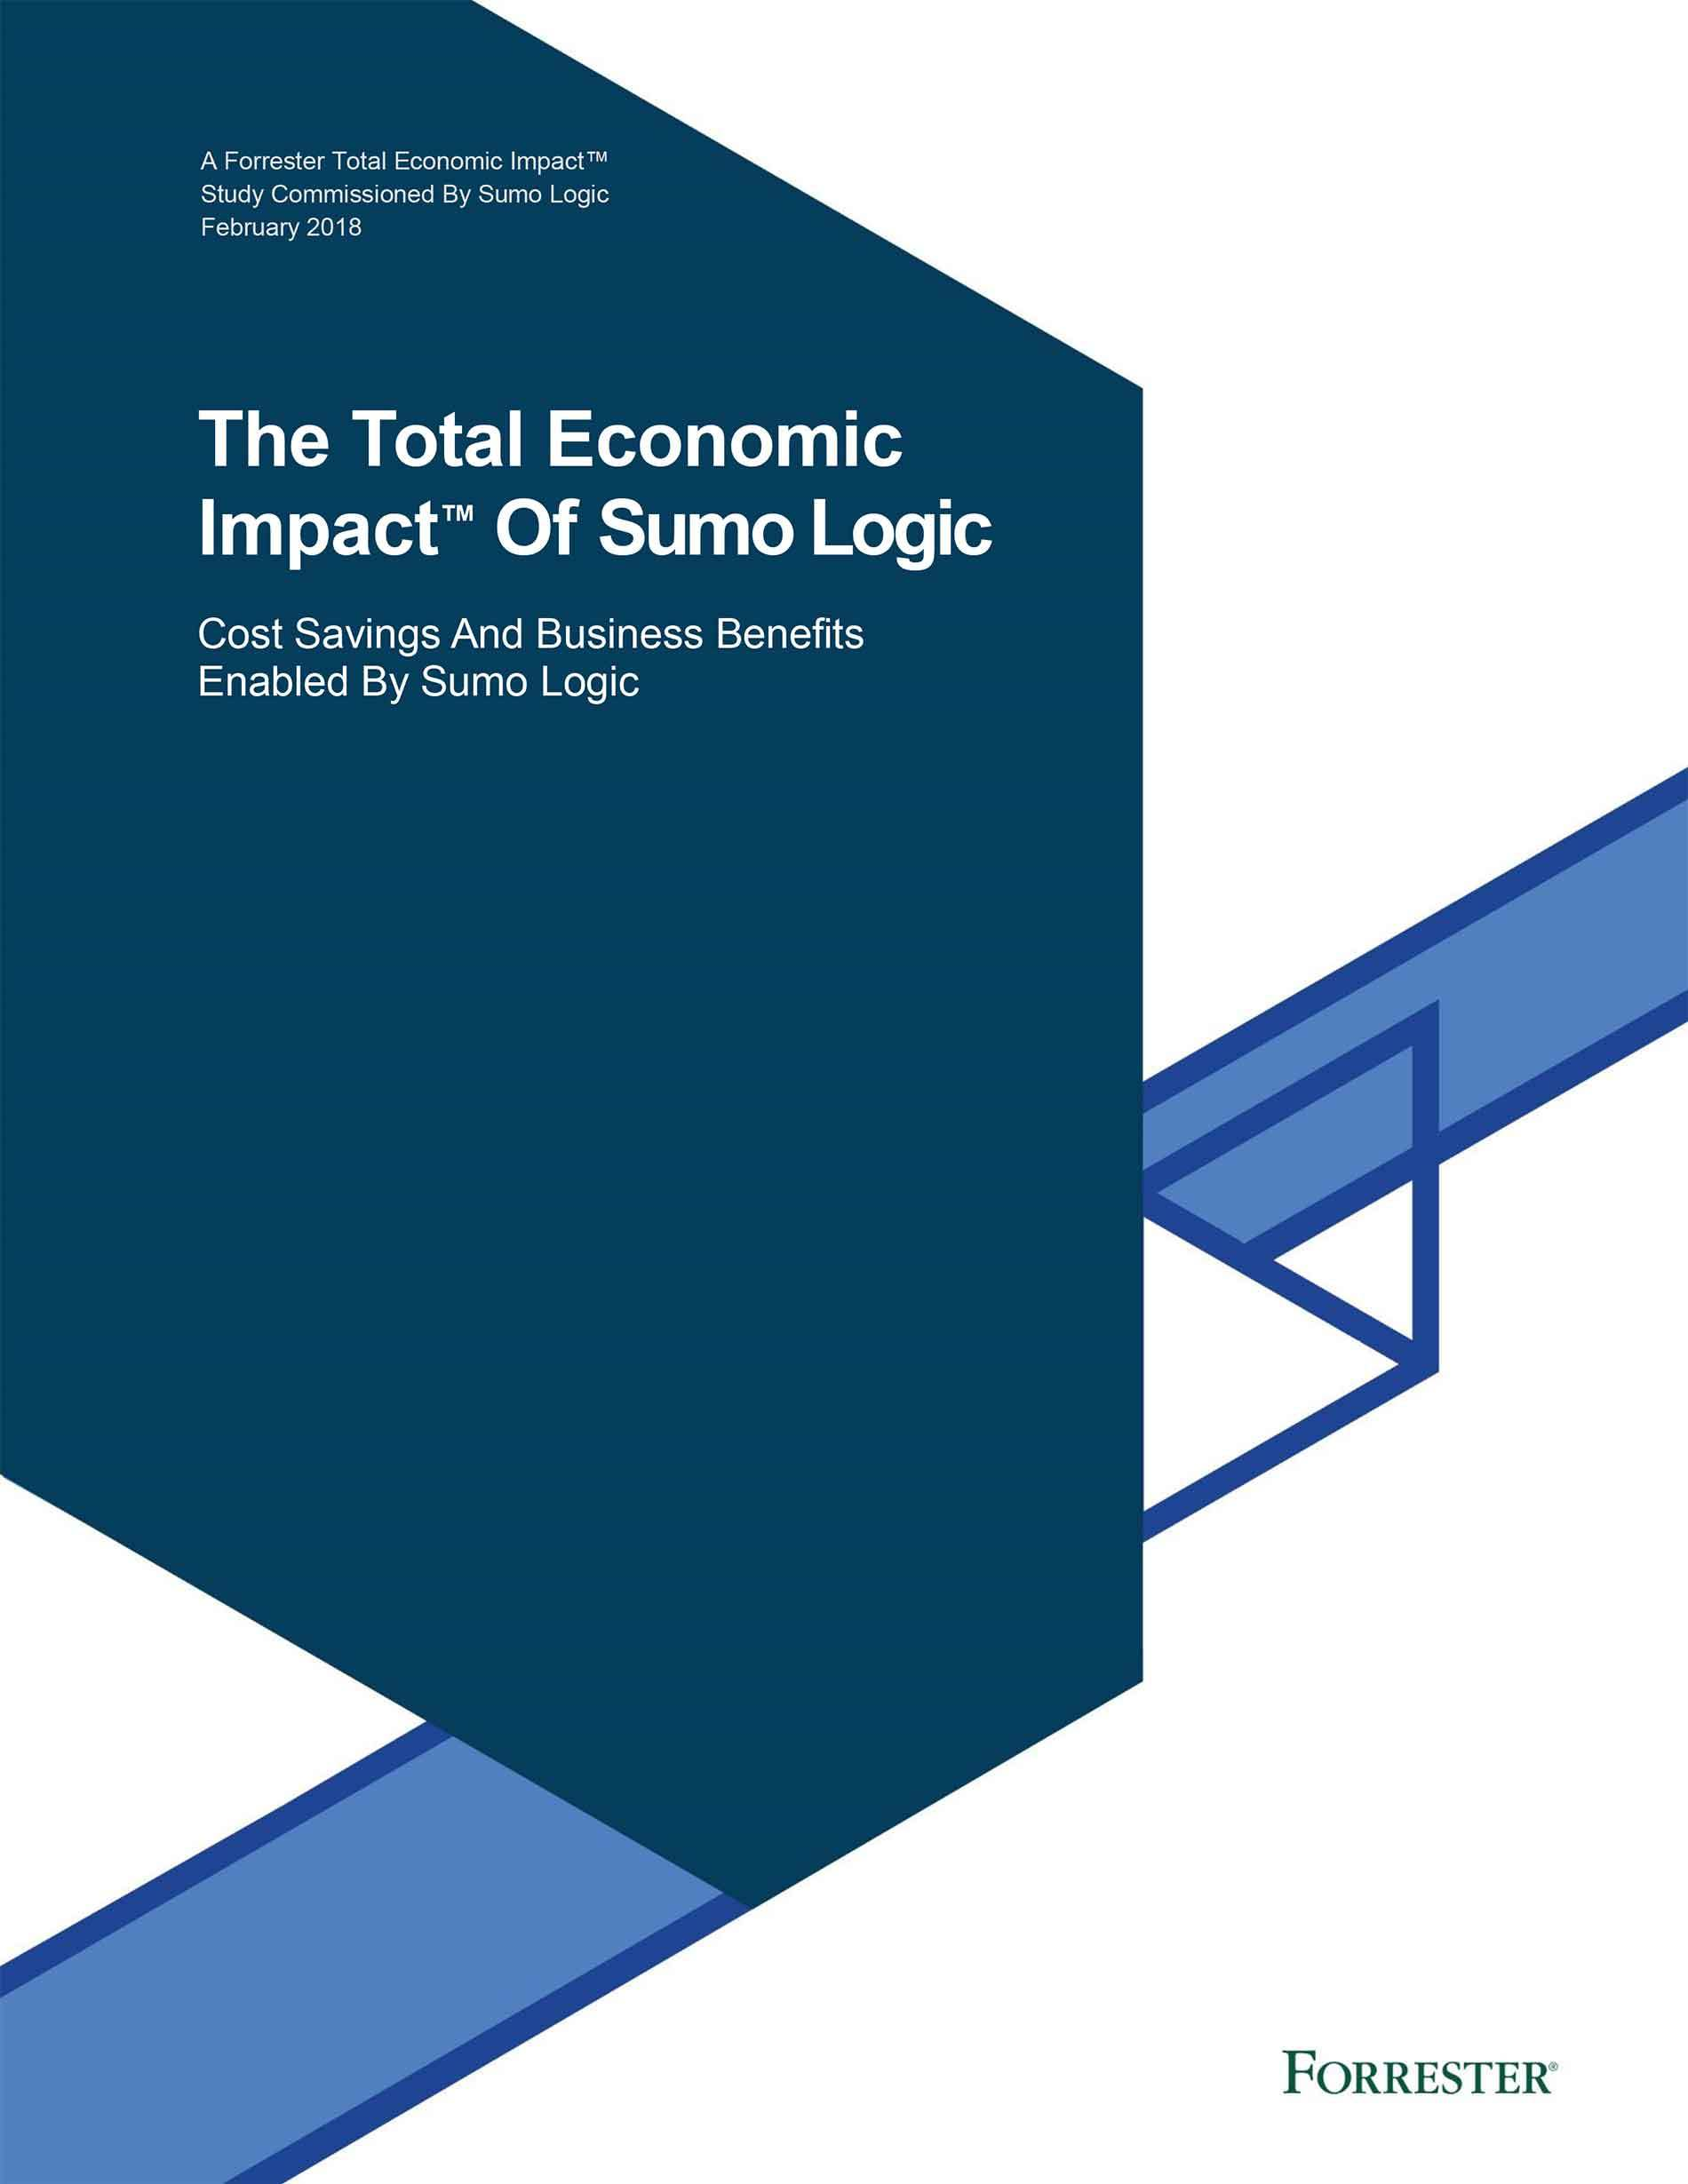 Forrester Total Economic Impact of Sumo Logic